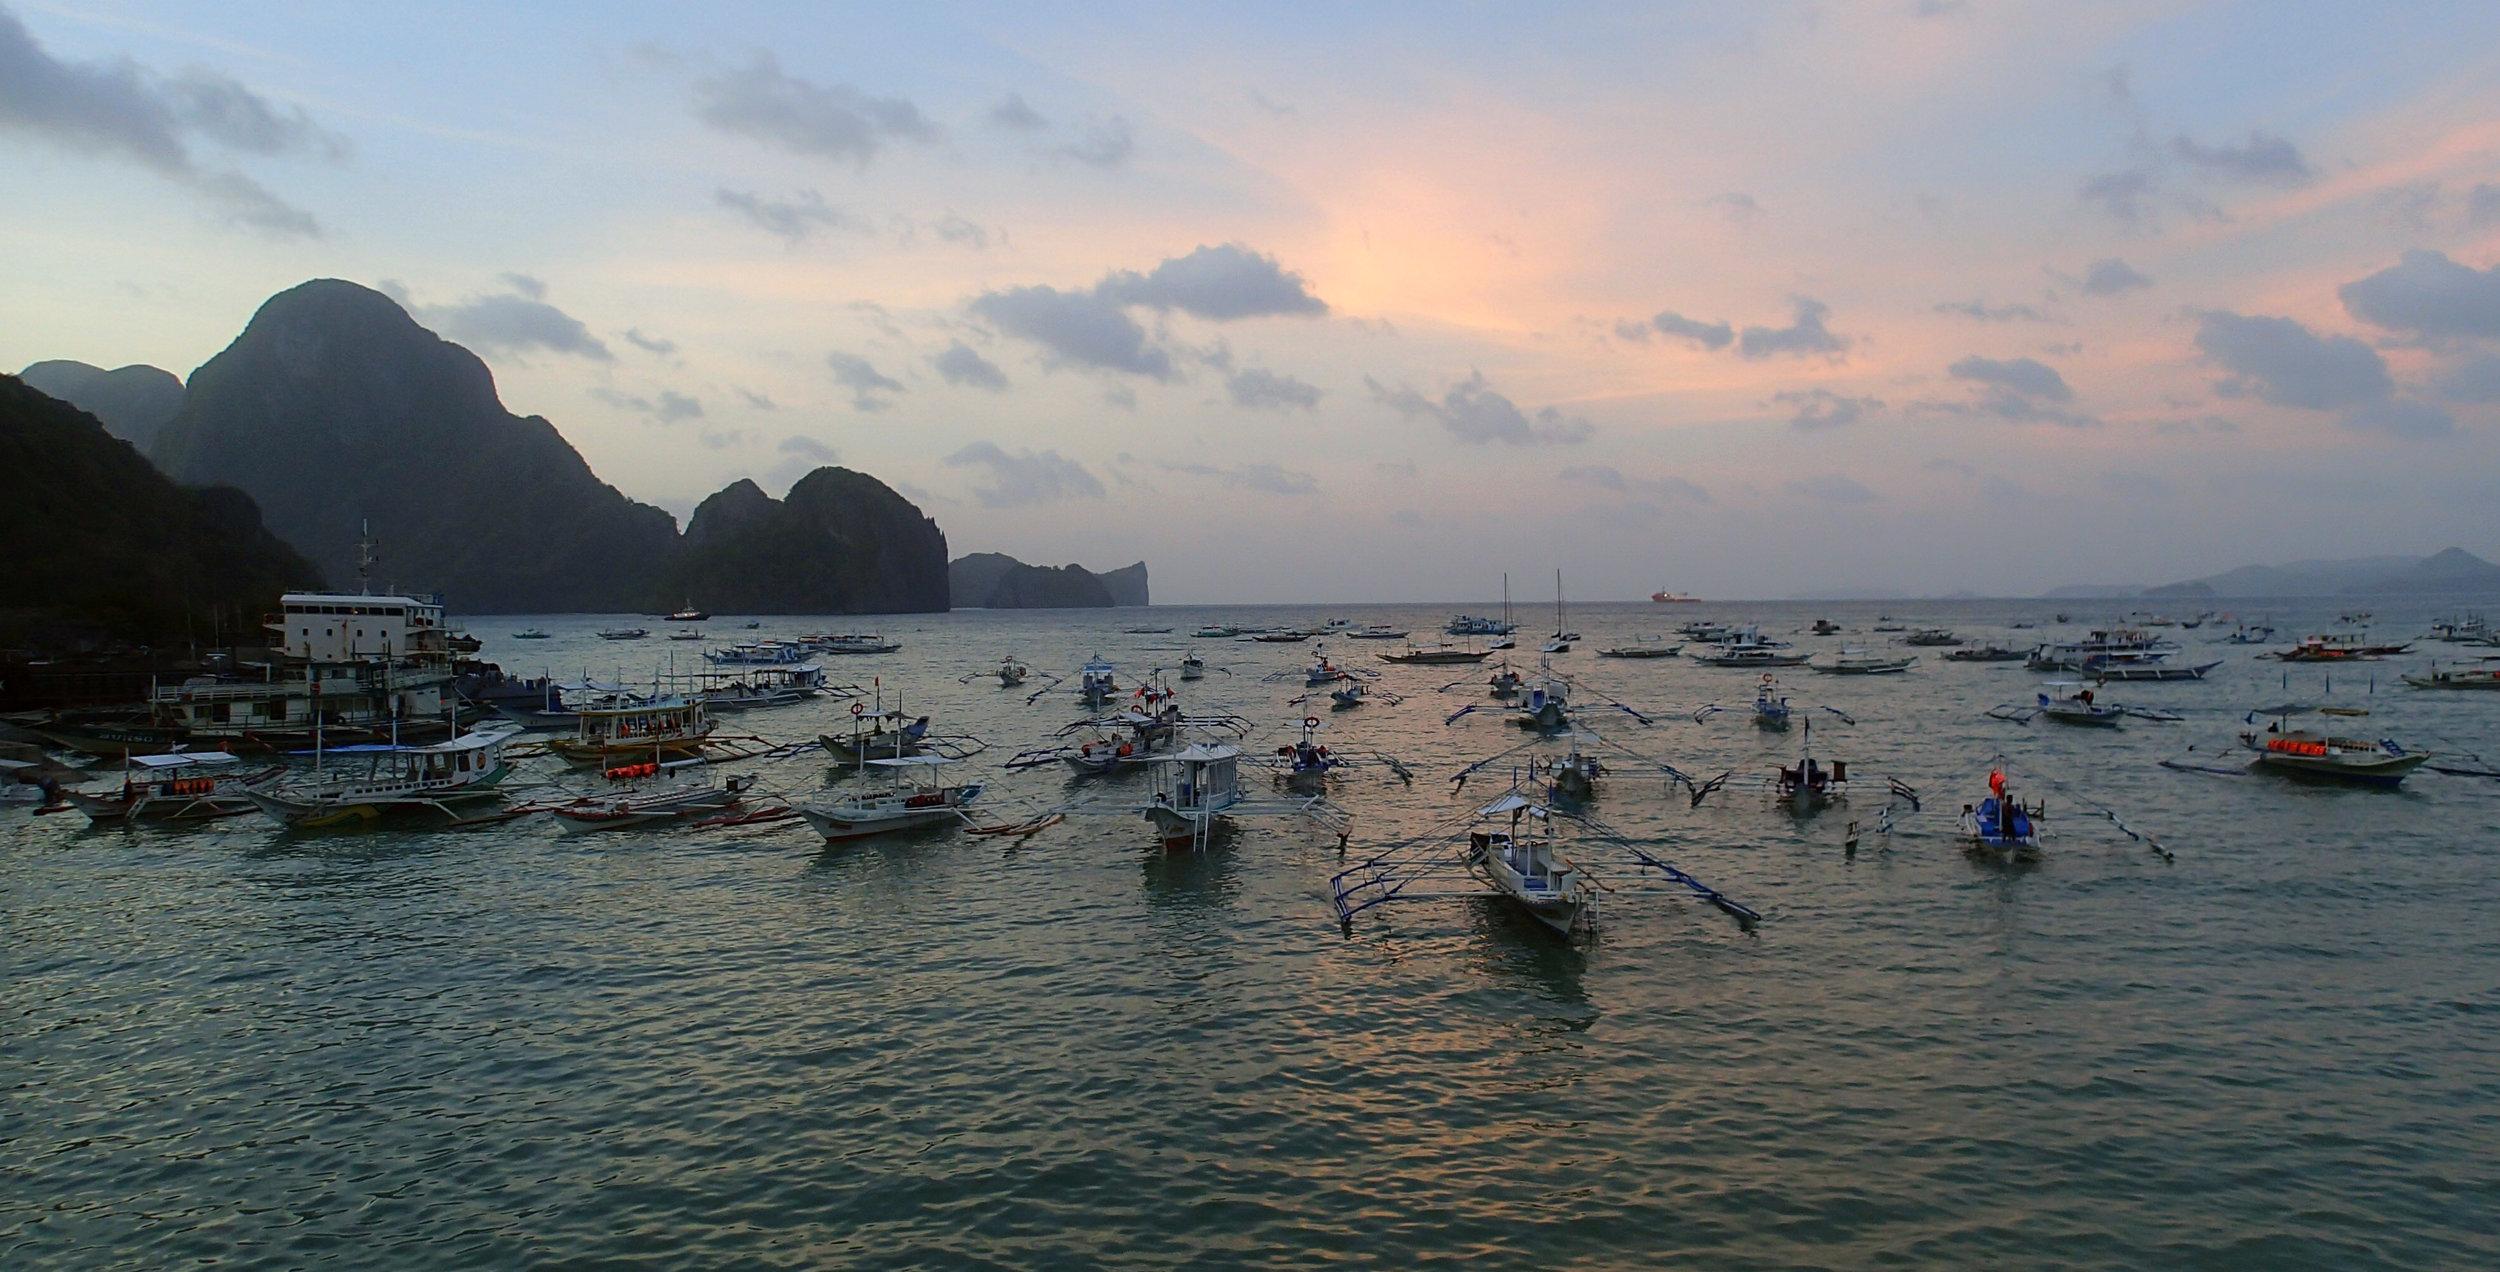 sunset 1-24-17.jpg